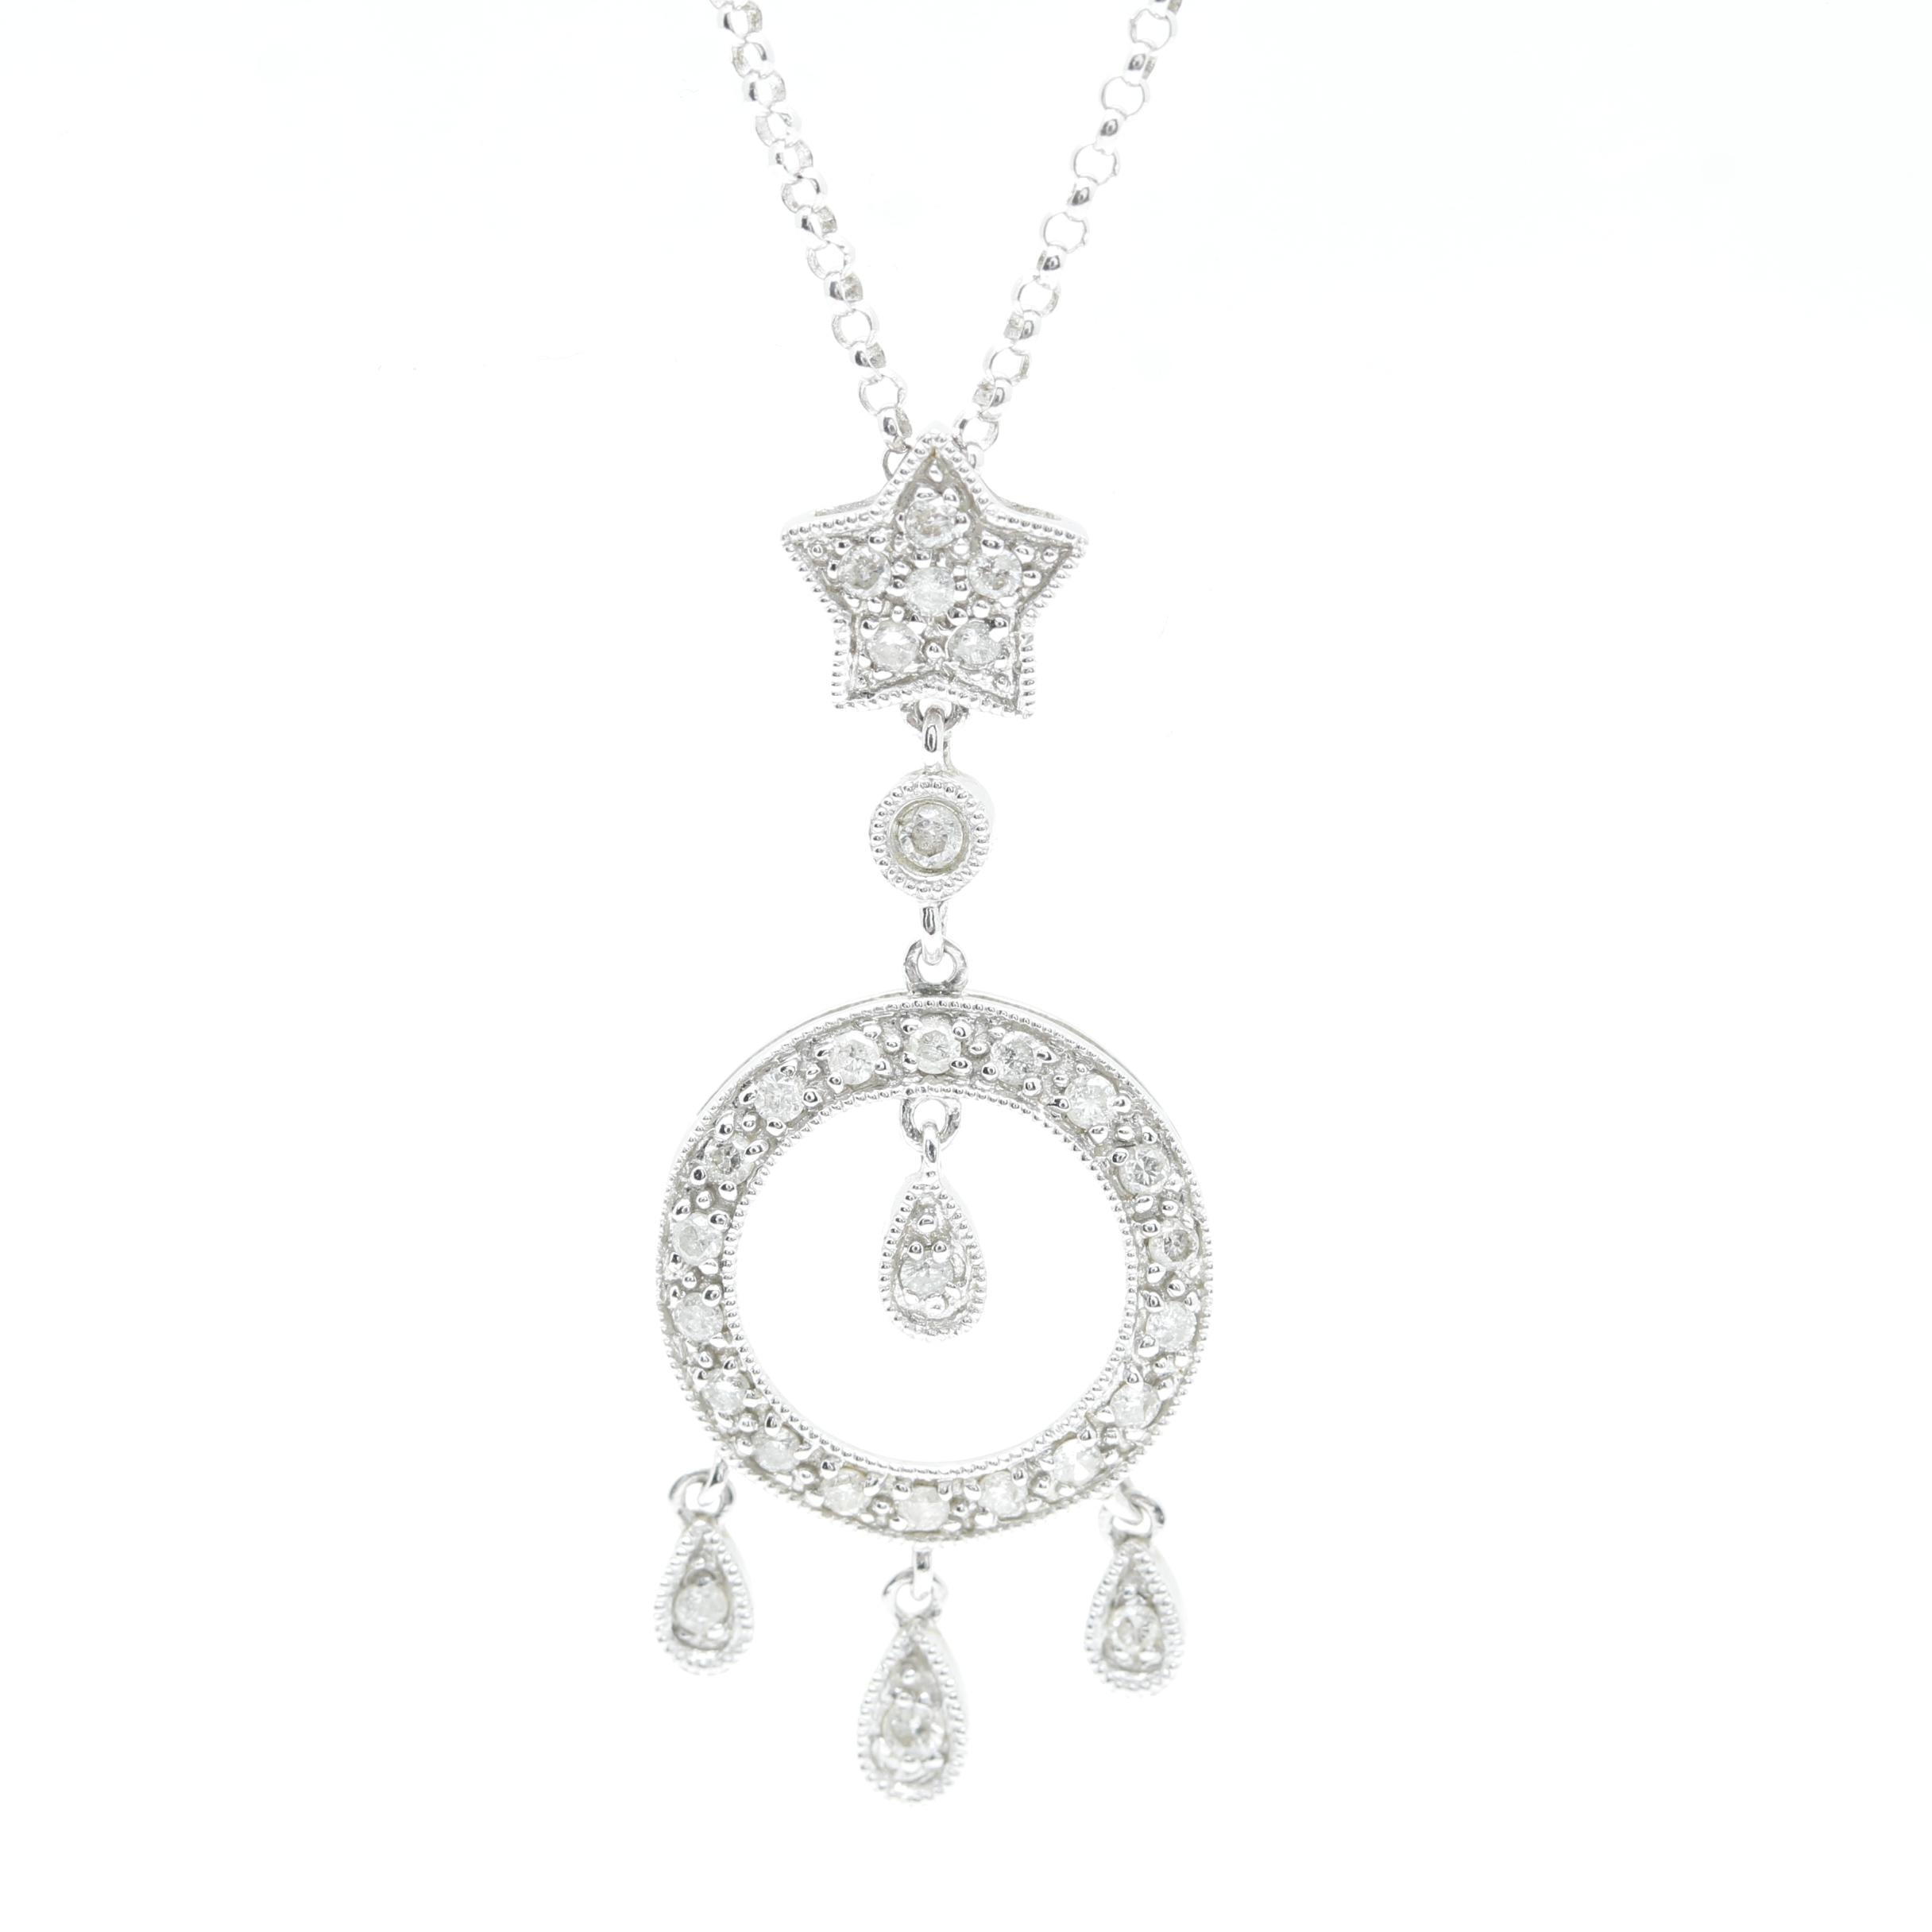 14K White Gold Diamond Geometric Pendant Necklace